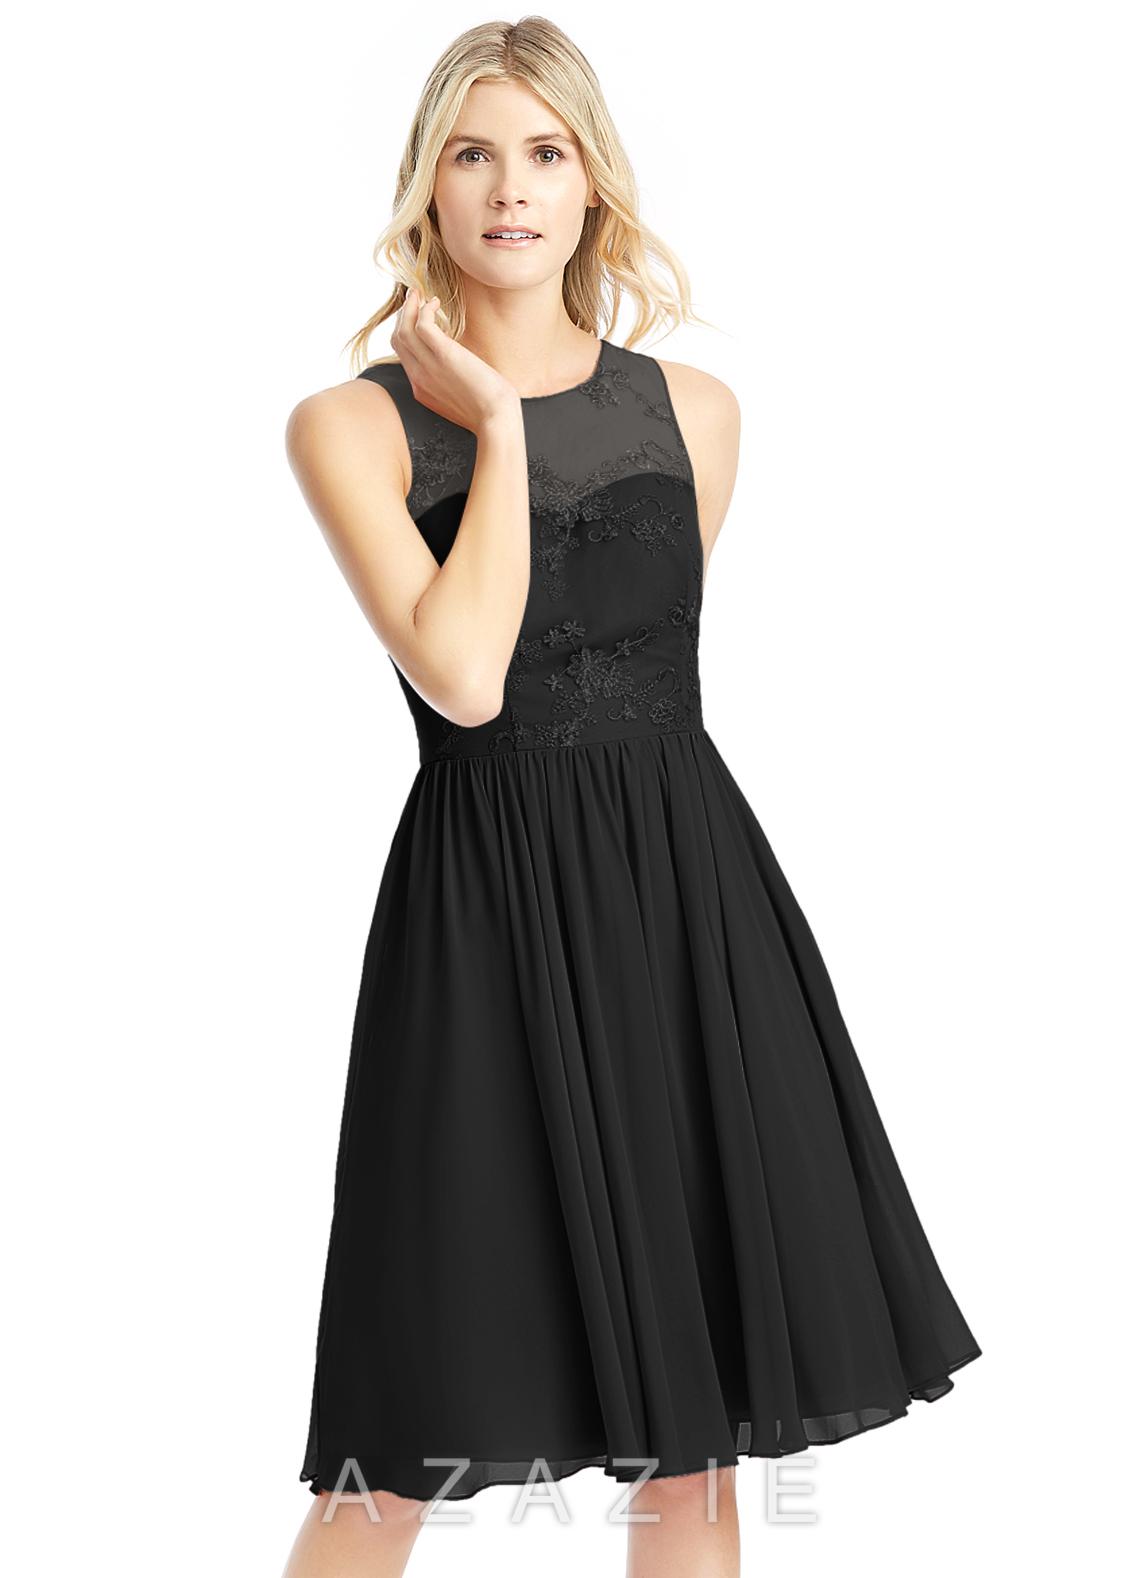 Azazie victoria bridesmaid dress azazie color black ombrellifo Images